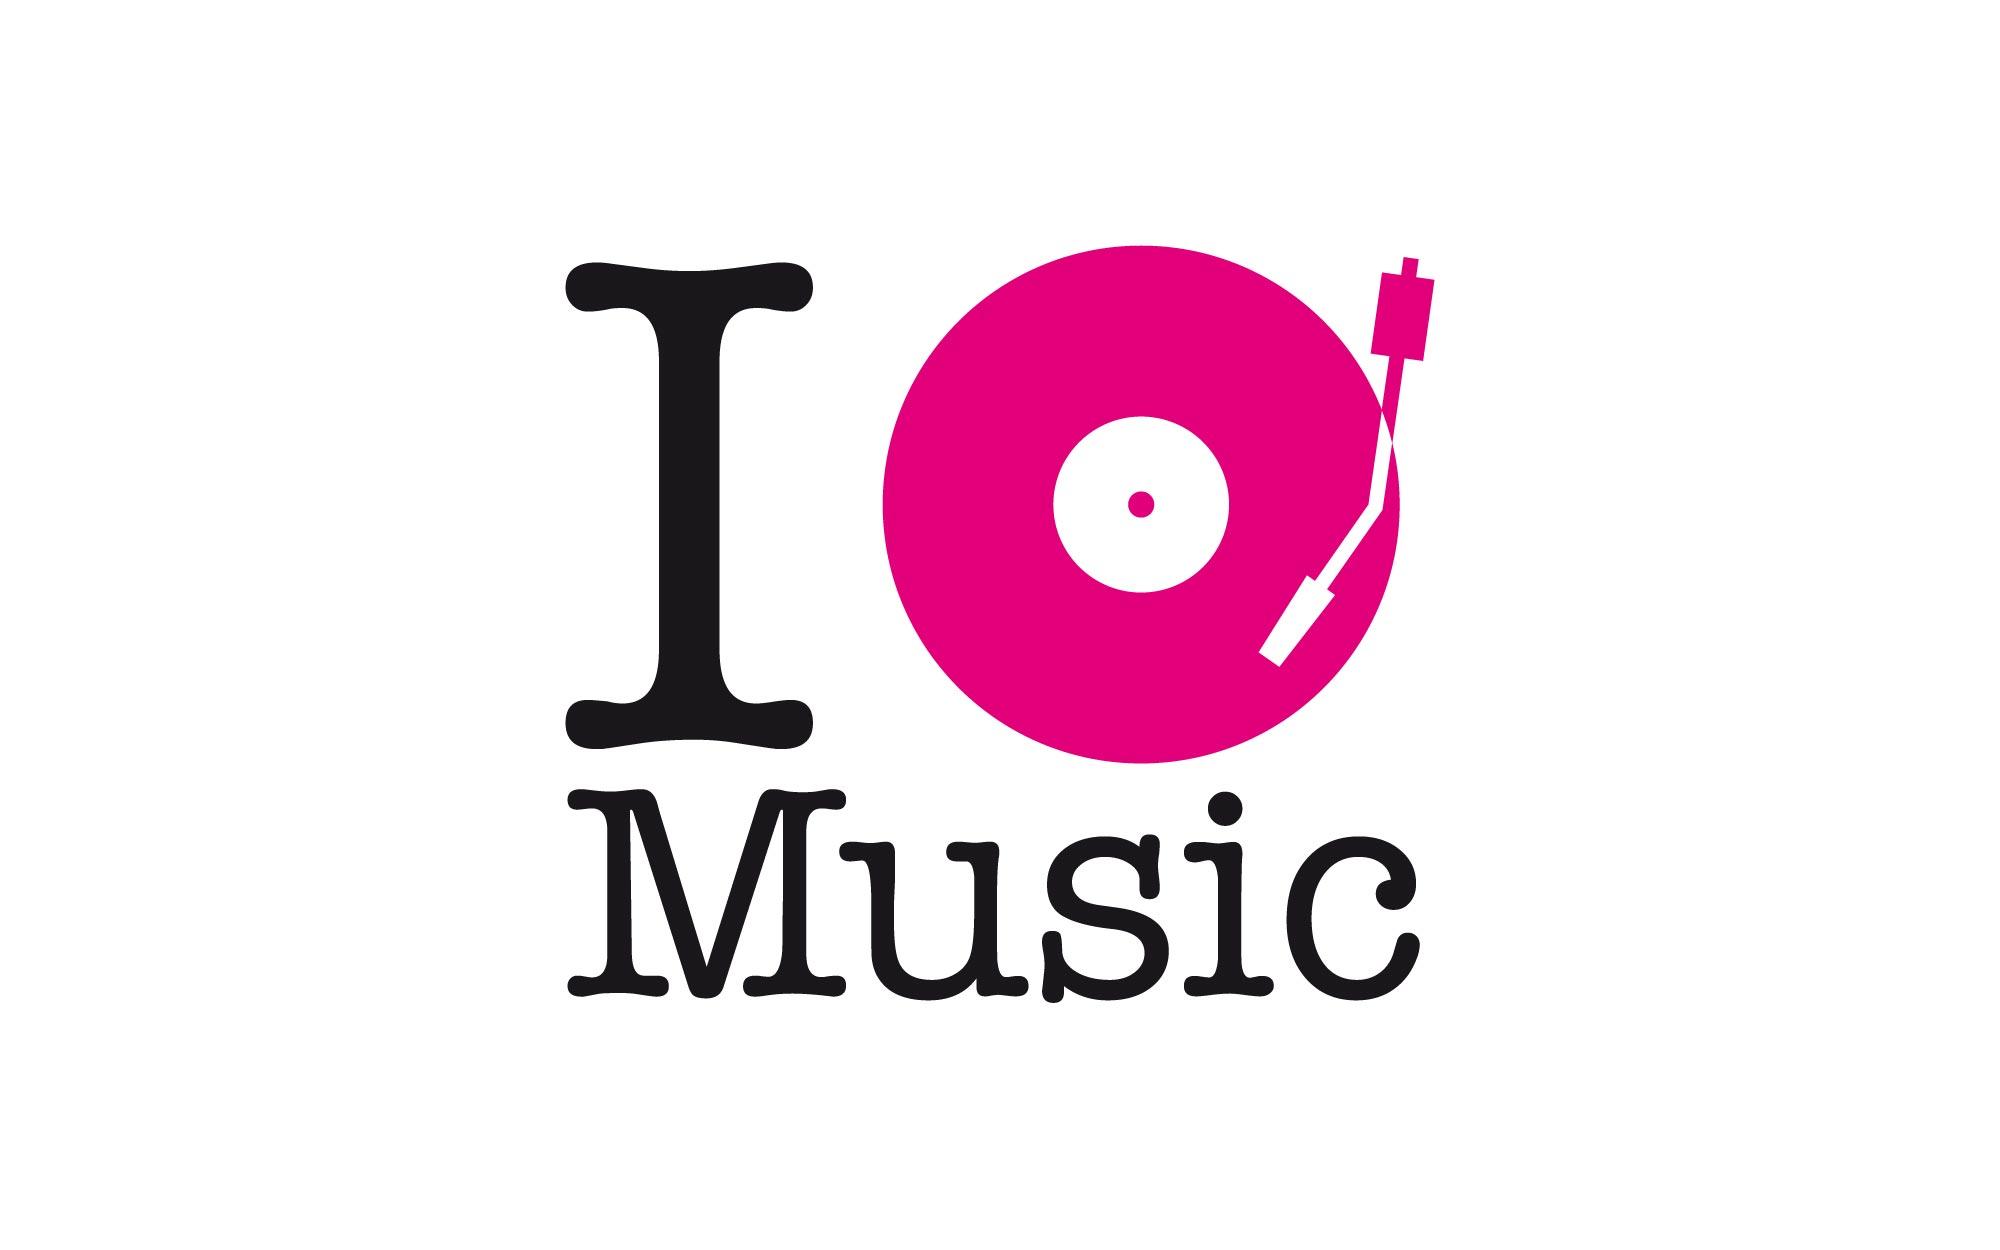 I love Music DJane4tune